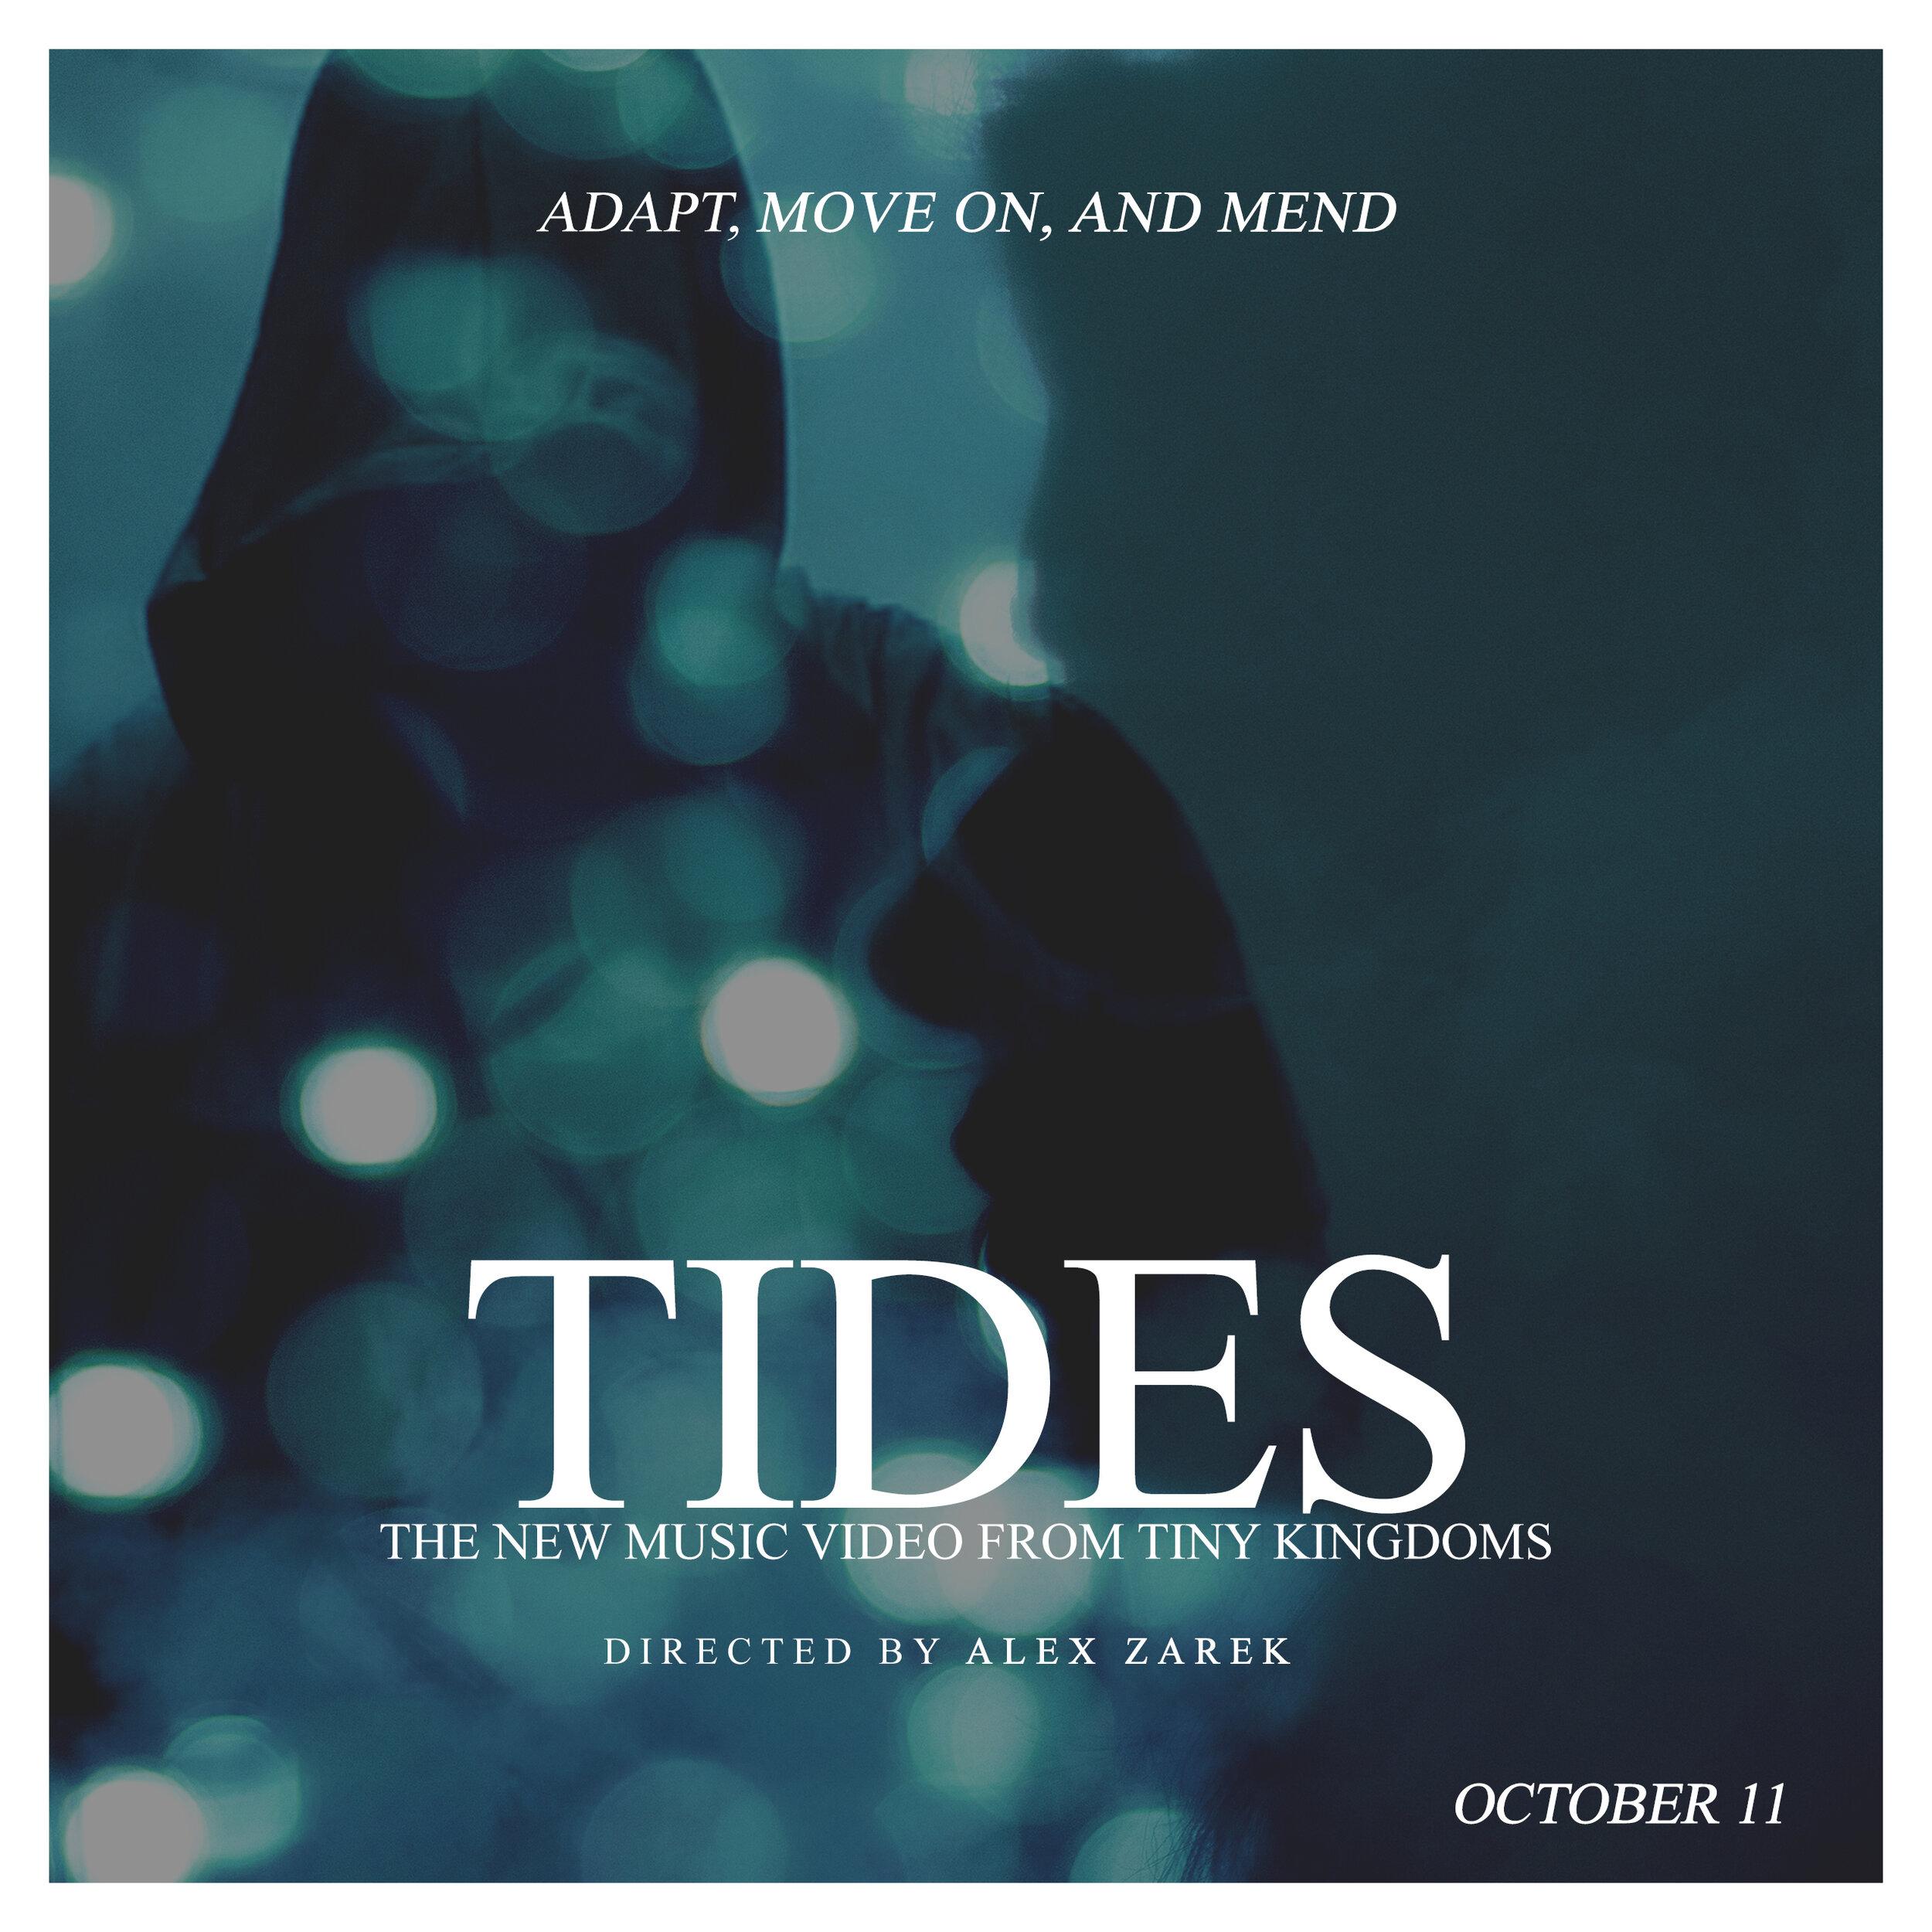 TinyKingdoms-Tides-MoviePoster-SQ-AZ.jpg